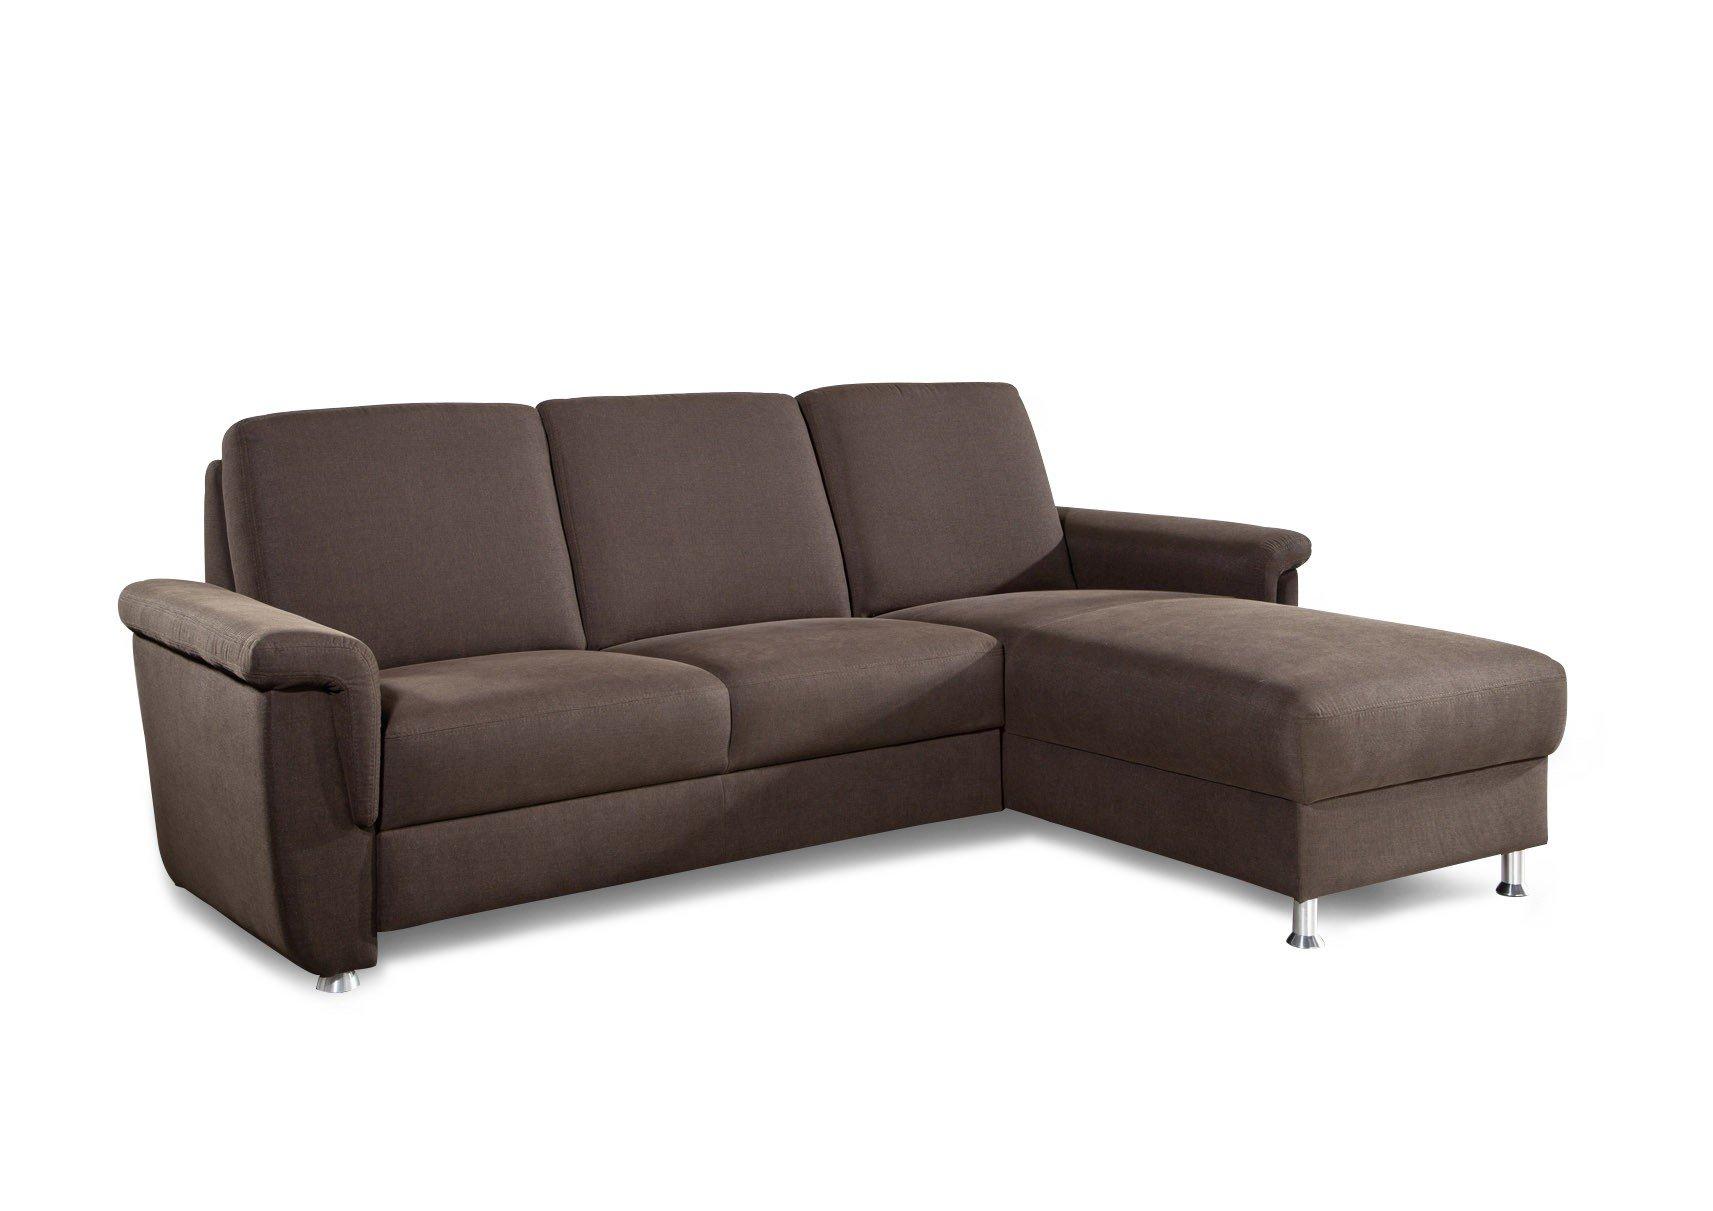 gruber polsterm bel imperial ecksofa in braun m bel letz ihr online shop. Black Bedroom Furniture Sets. Home Design Ideas